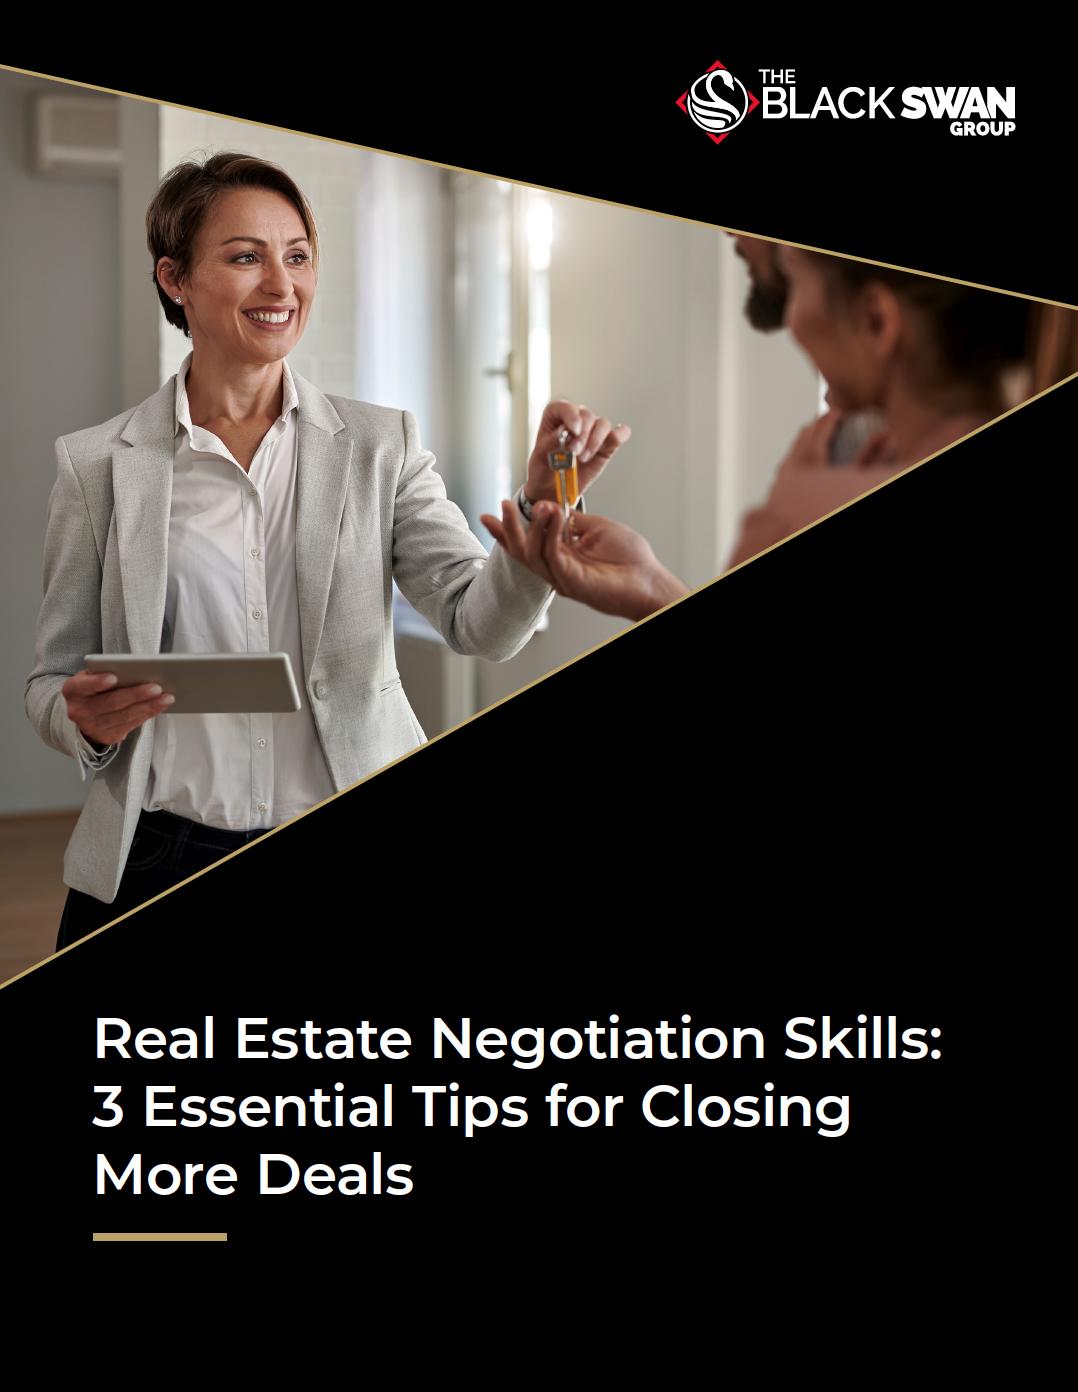 Real Estate Negotiation Skills: 3 Essential Tips for Closing More Deals